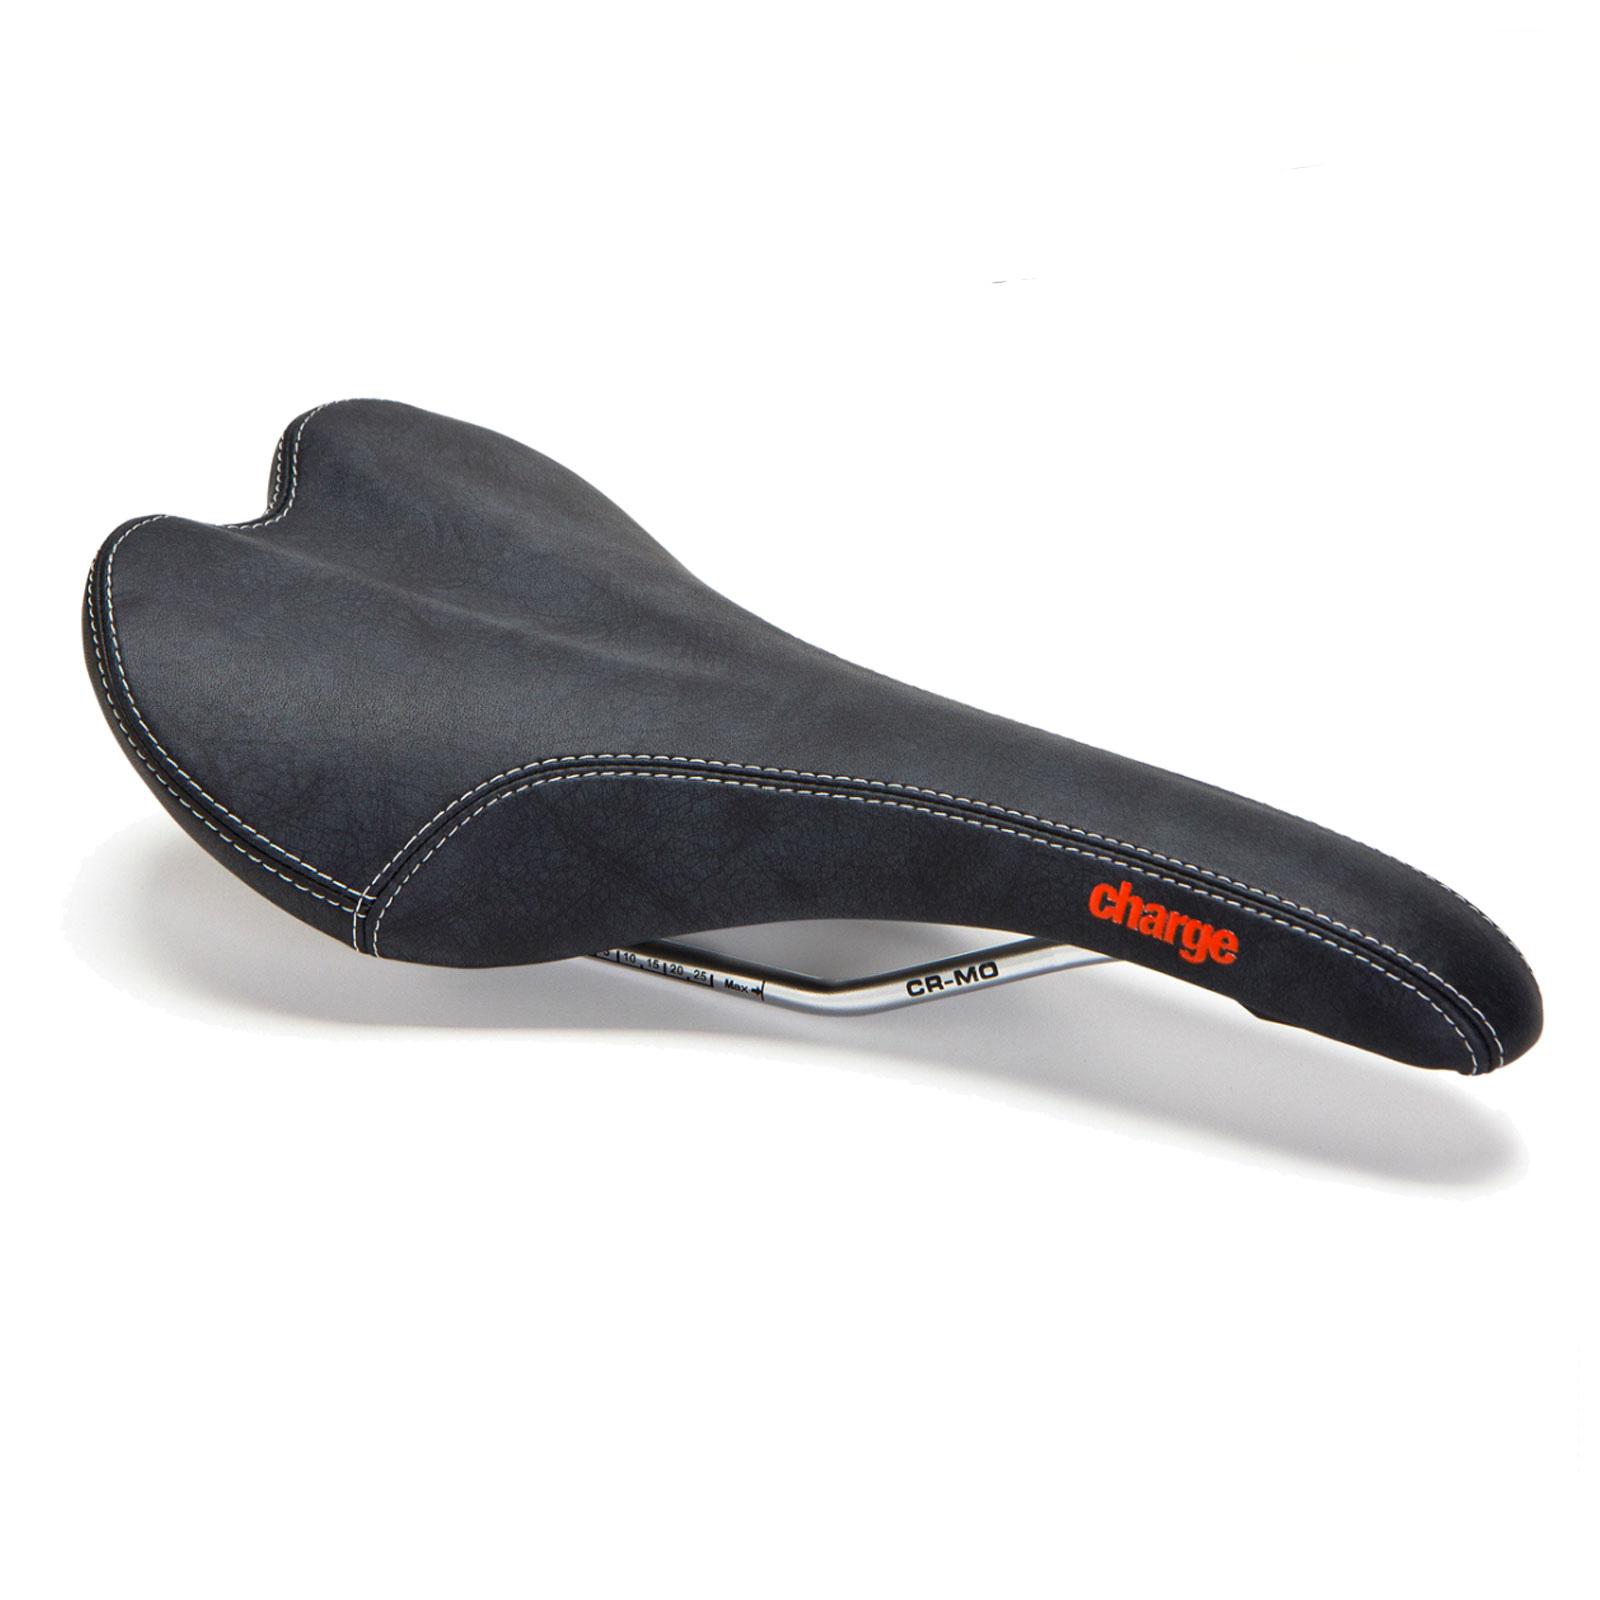 Charge-Spoon-Lightweight-Enduro-Mountain-Bike-Hybrid-Road-Bicycle-Saddle-New